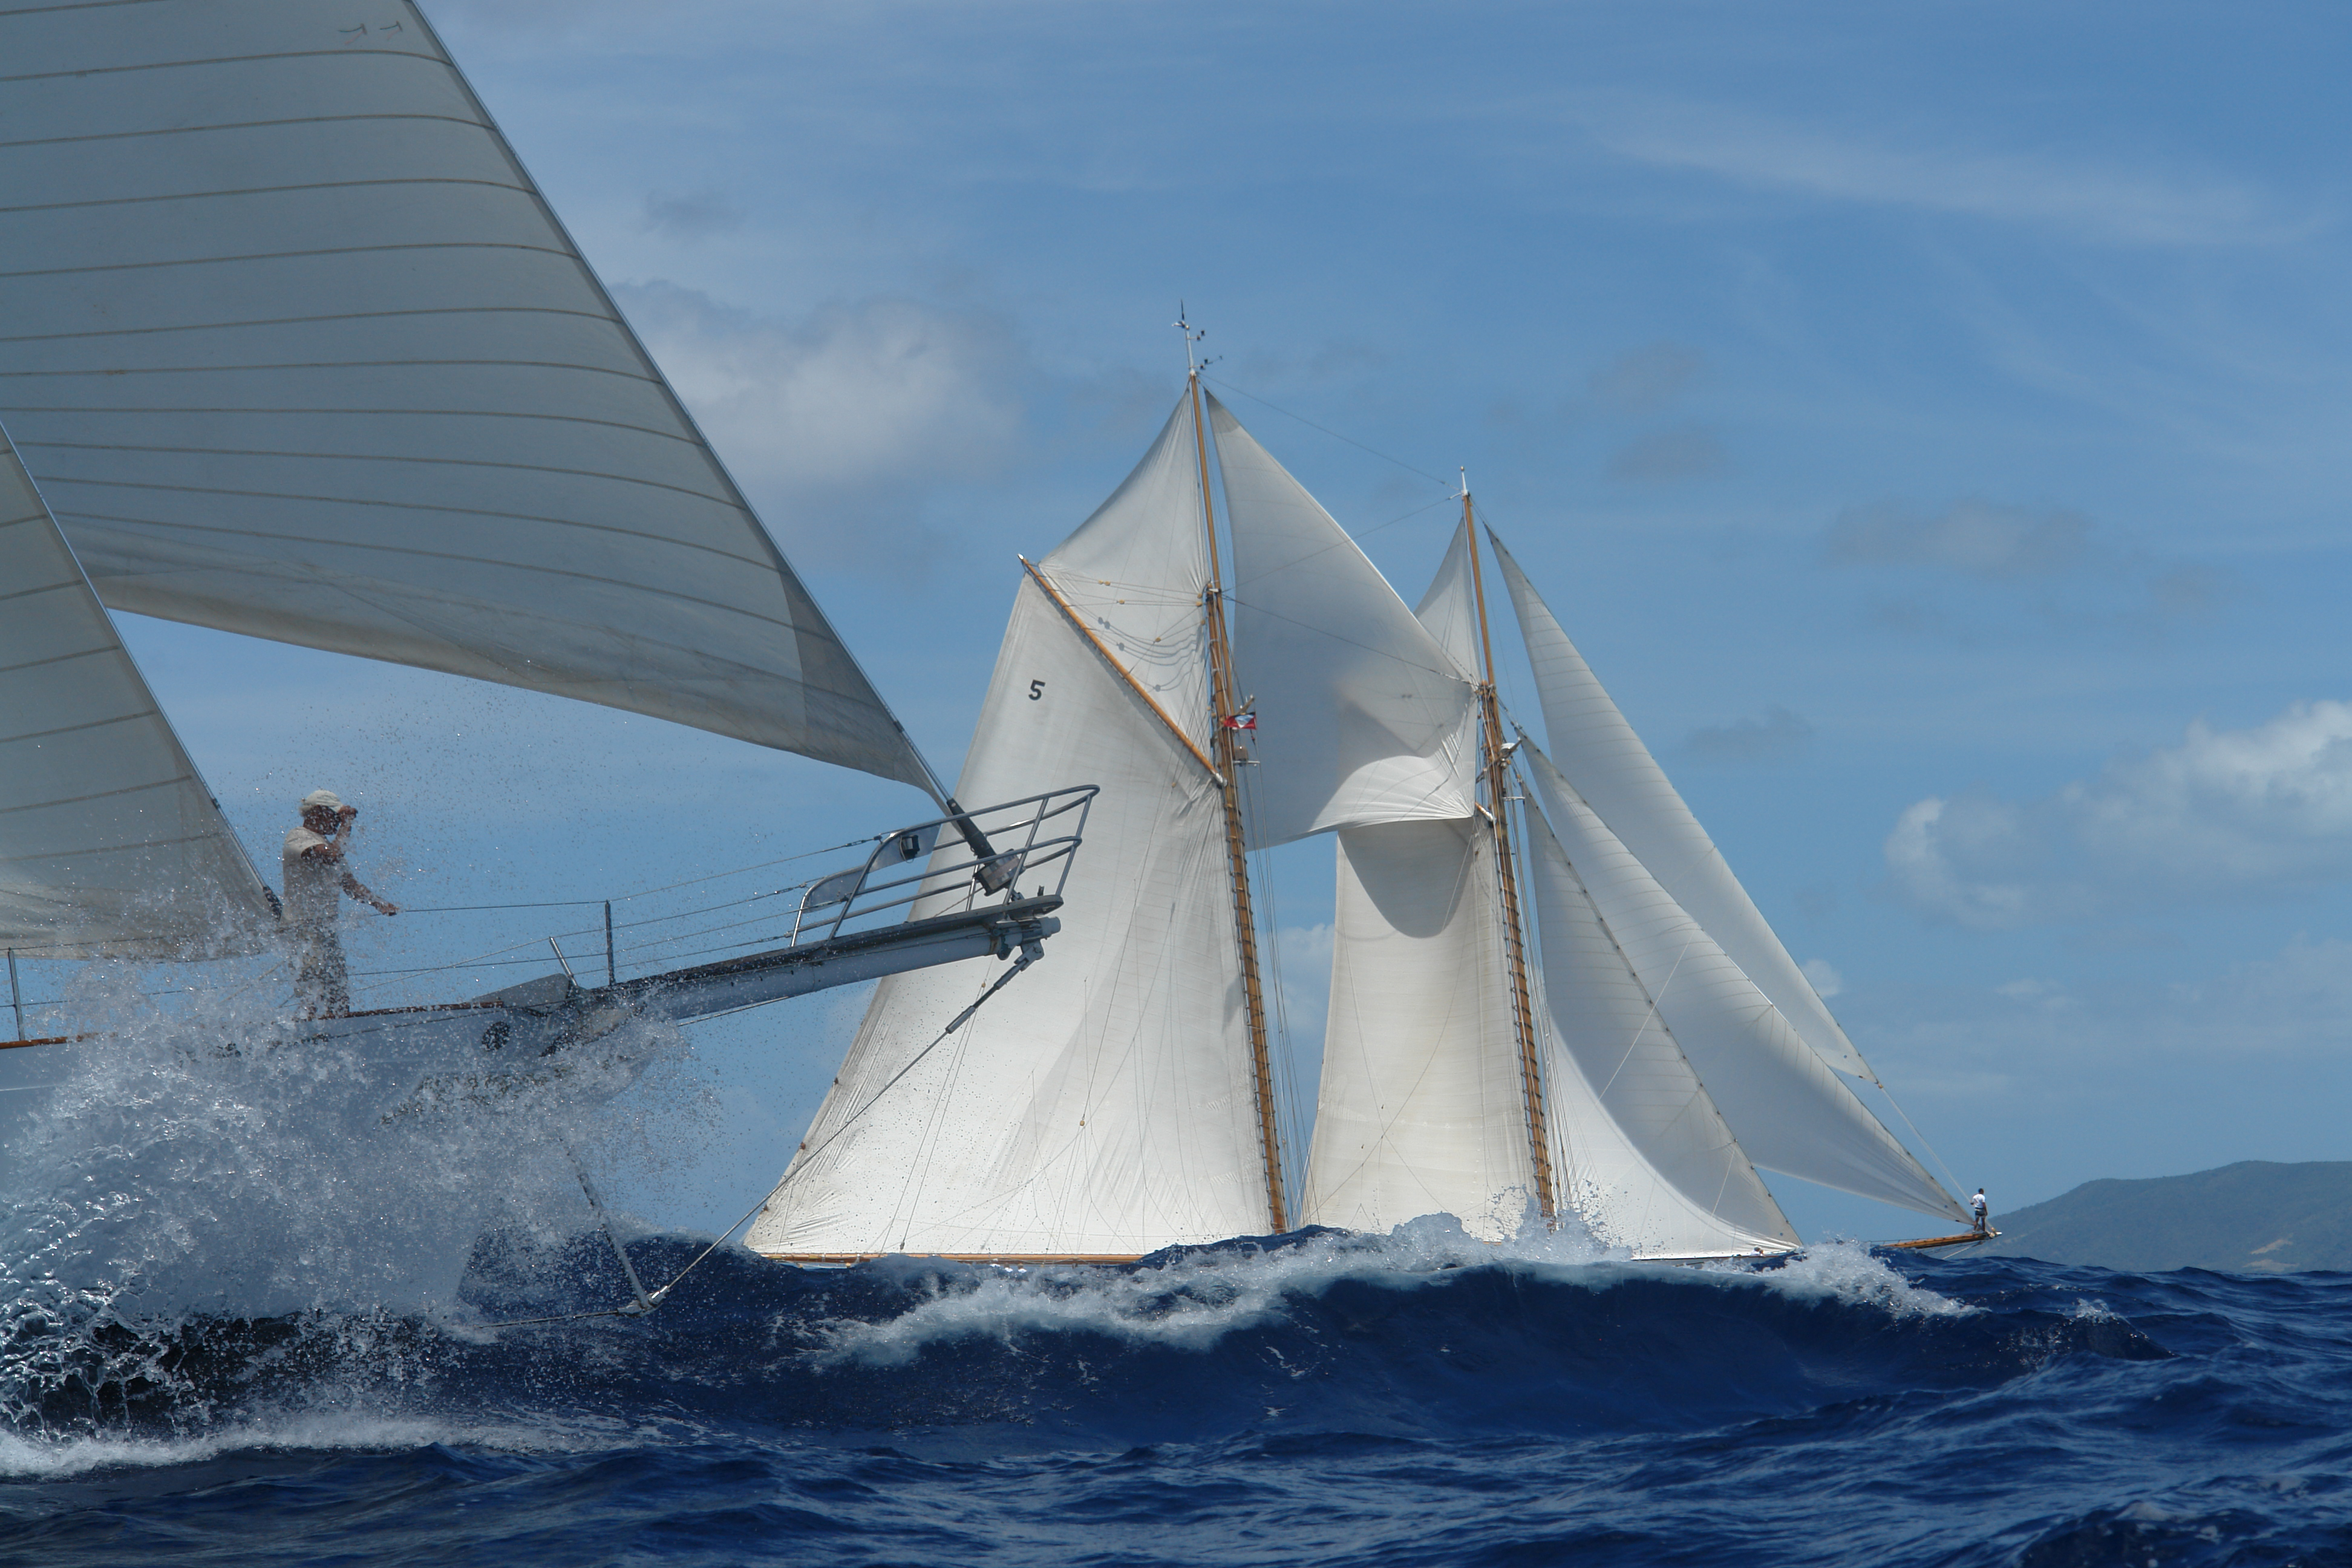 Sailing Yachts Racing At The Antigua Classic Yacht Regatta Yacht Charter Amp Superyacht News